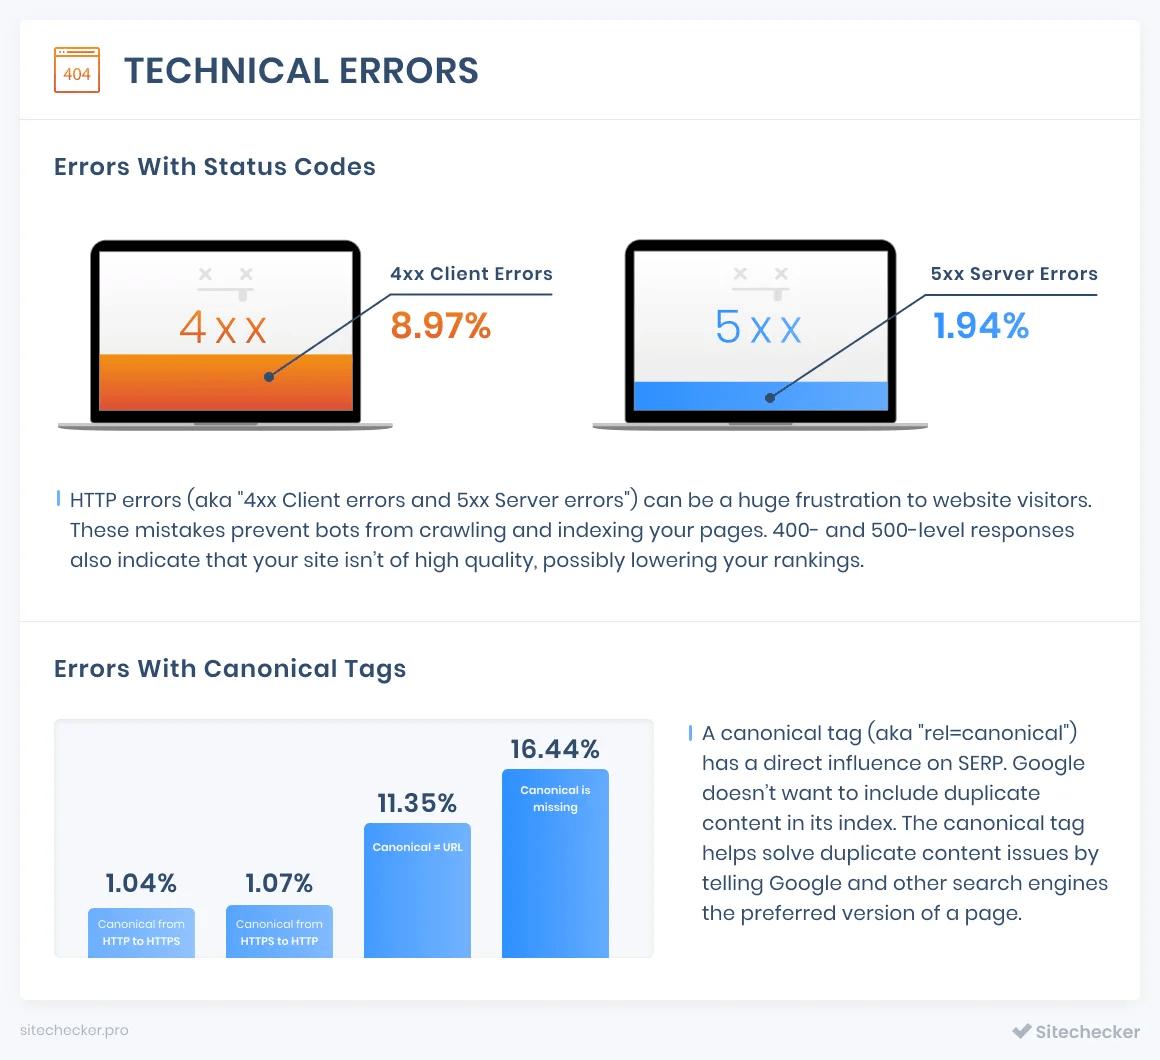 erreurs techniques